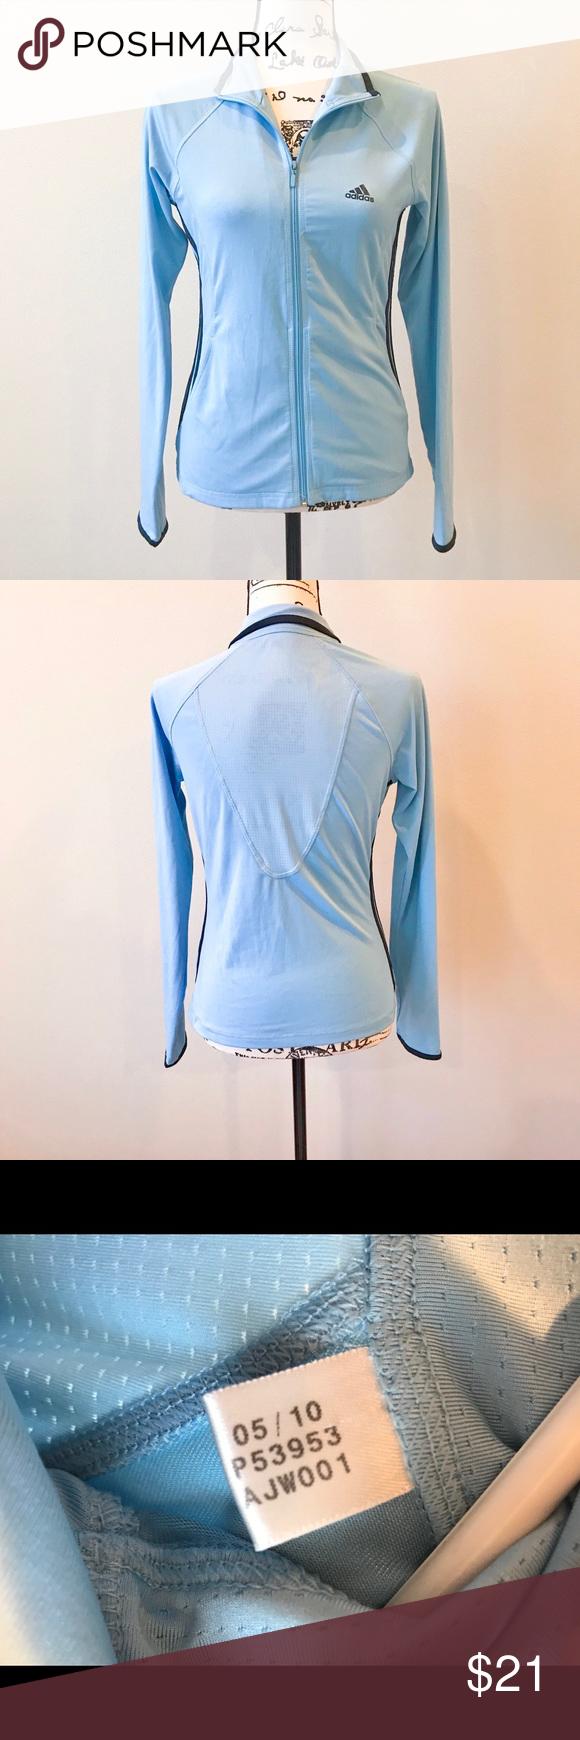 Adidas Women S Track Jacket Blue Adidas Women Track Jackets Clothes Design [ 1740 x 580 Pixel ]